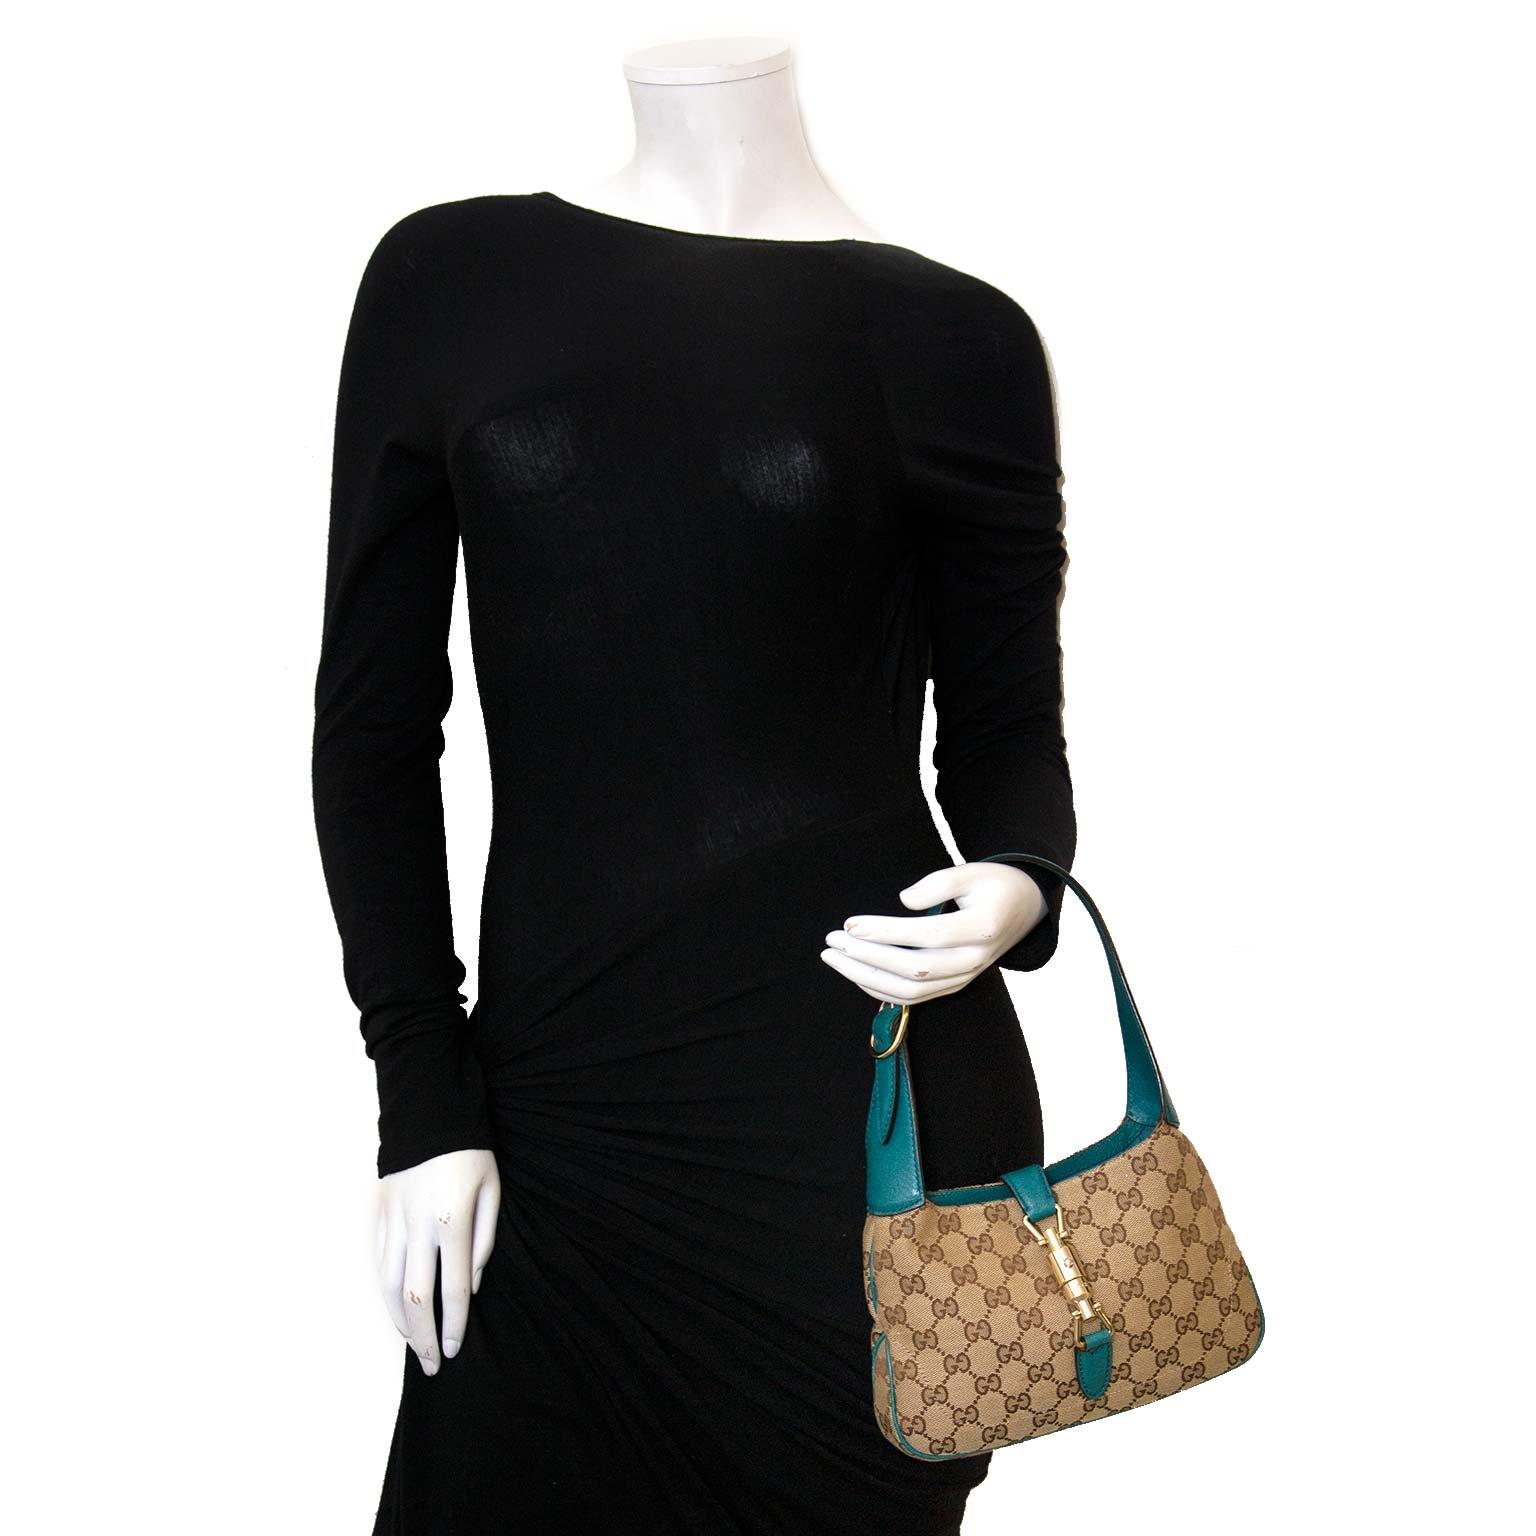 Koop authentieke Gucci tassen nu online bij Labellov vintage webshop